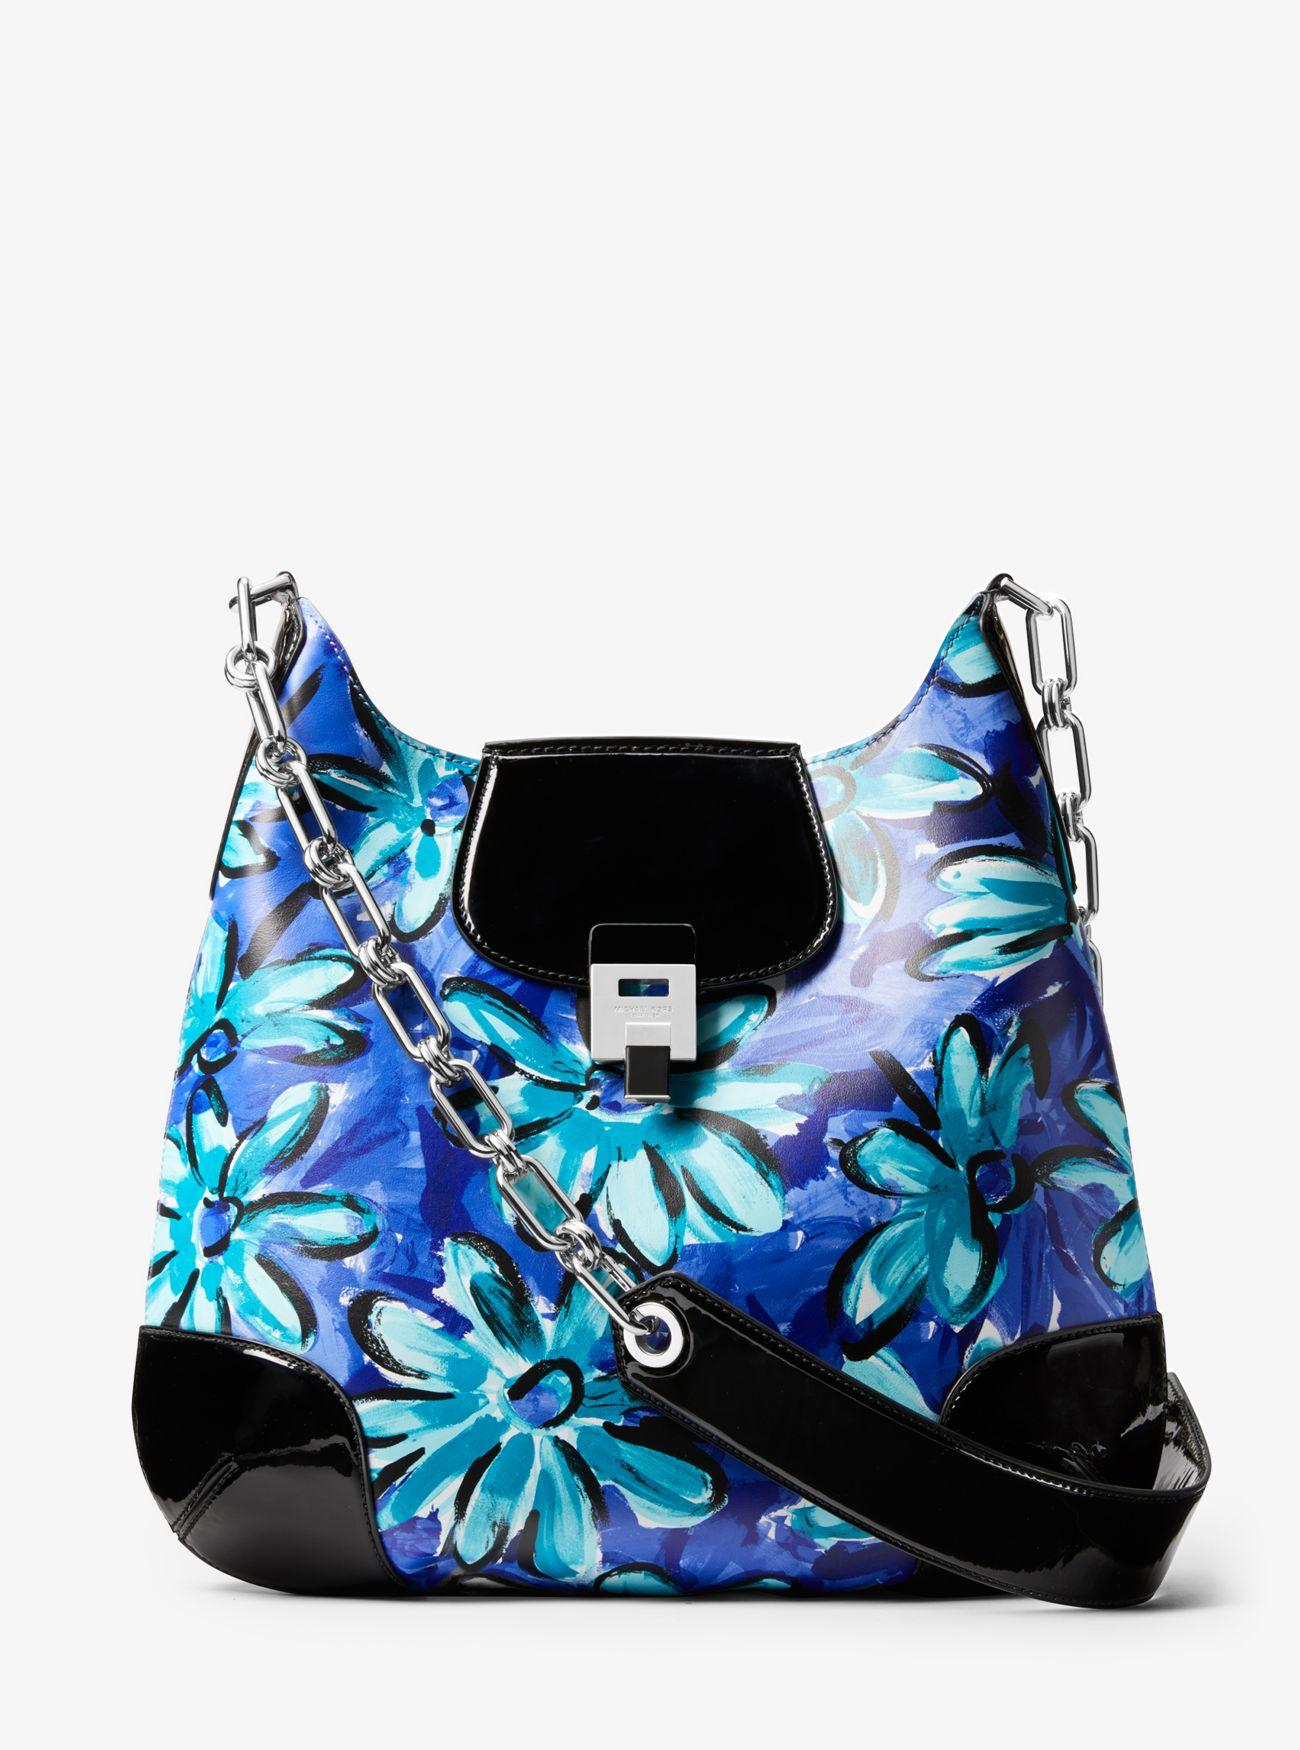 29b4c35a9fd66 Michael Kors. Women s Blue Bancroft Oversized Daisy Calf Leather Shoulder  Bag